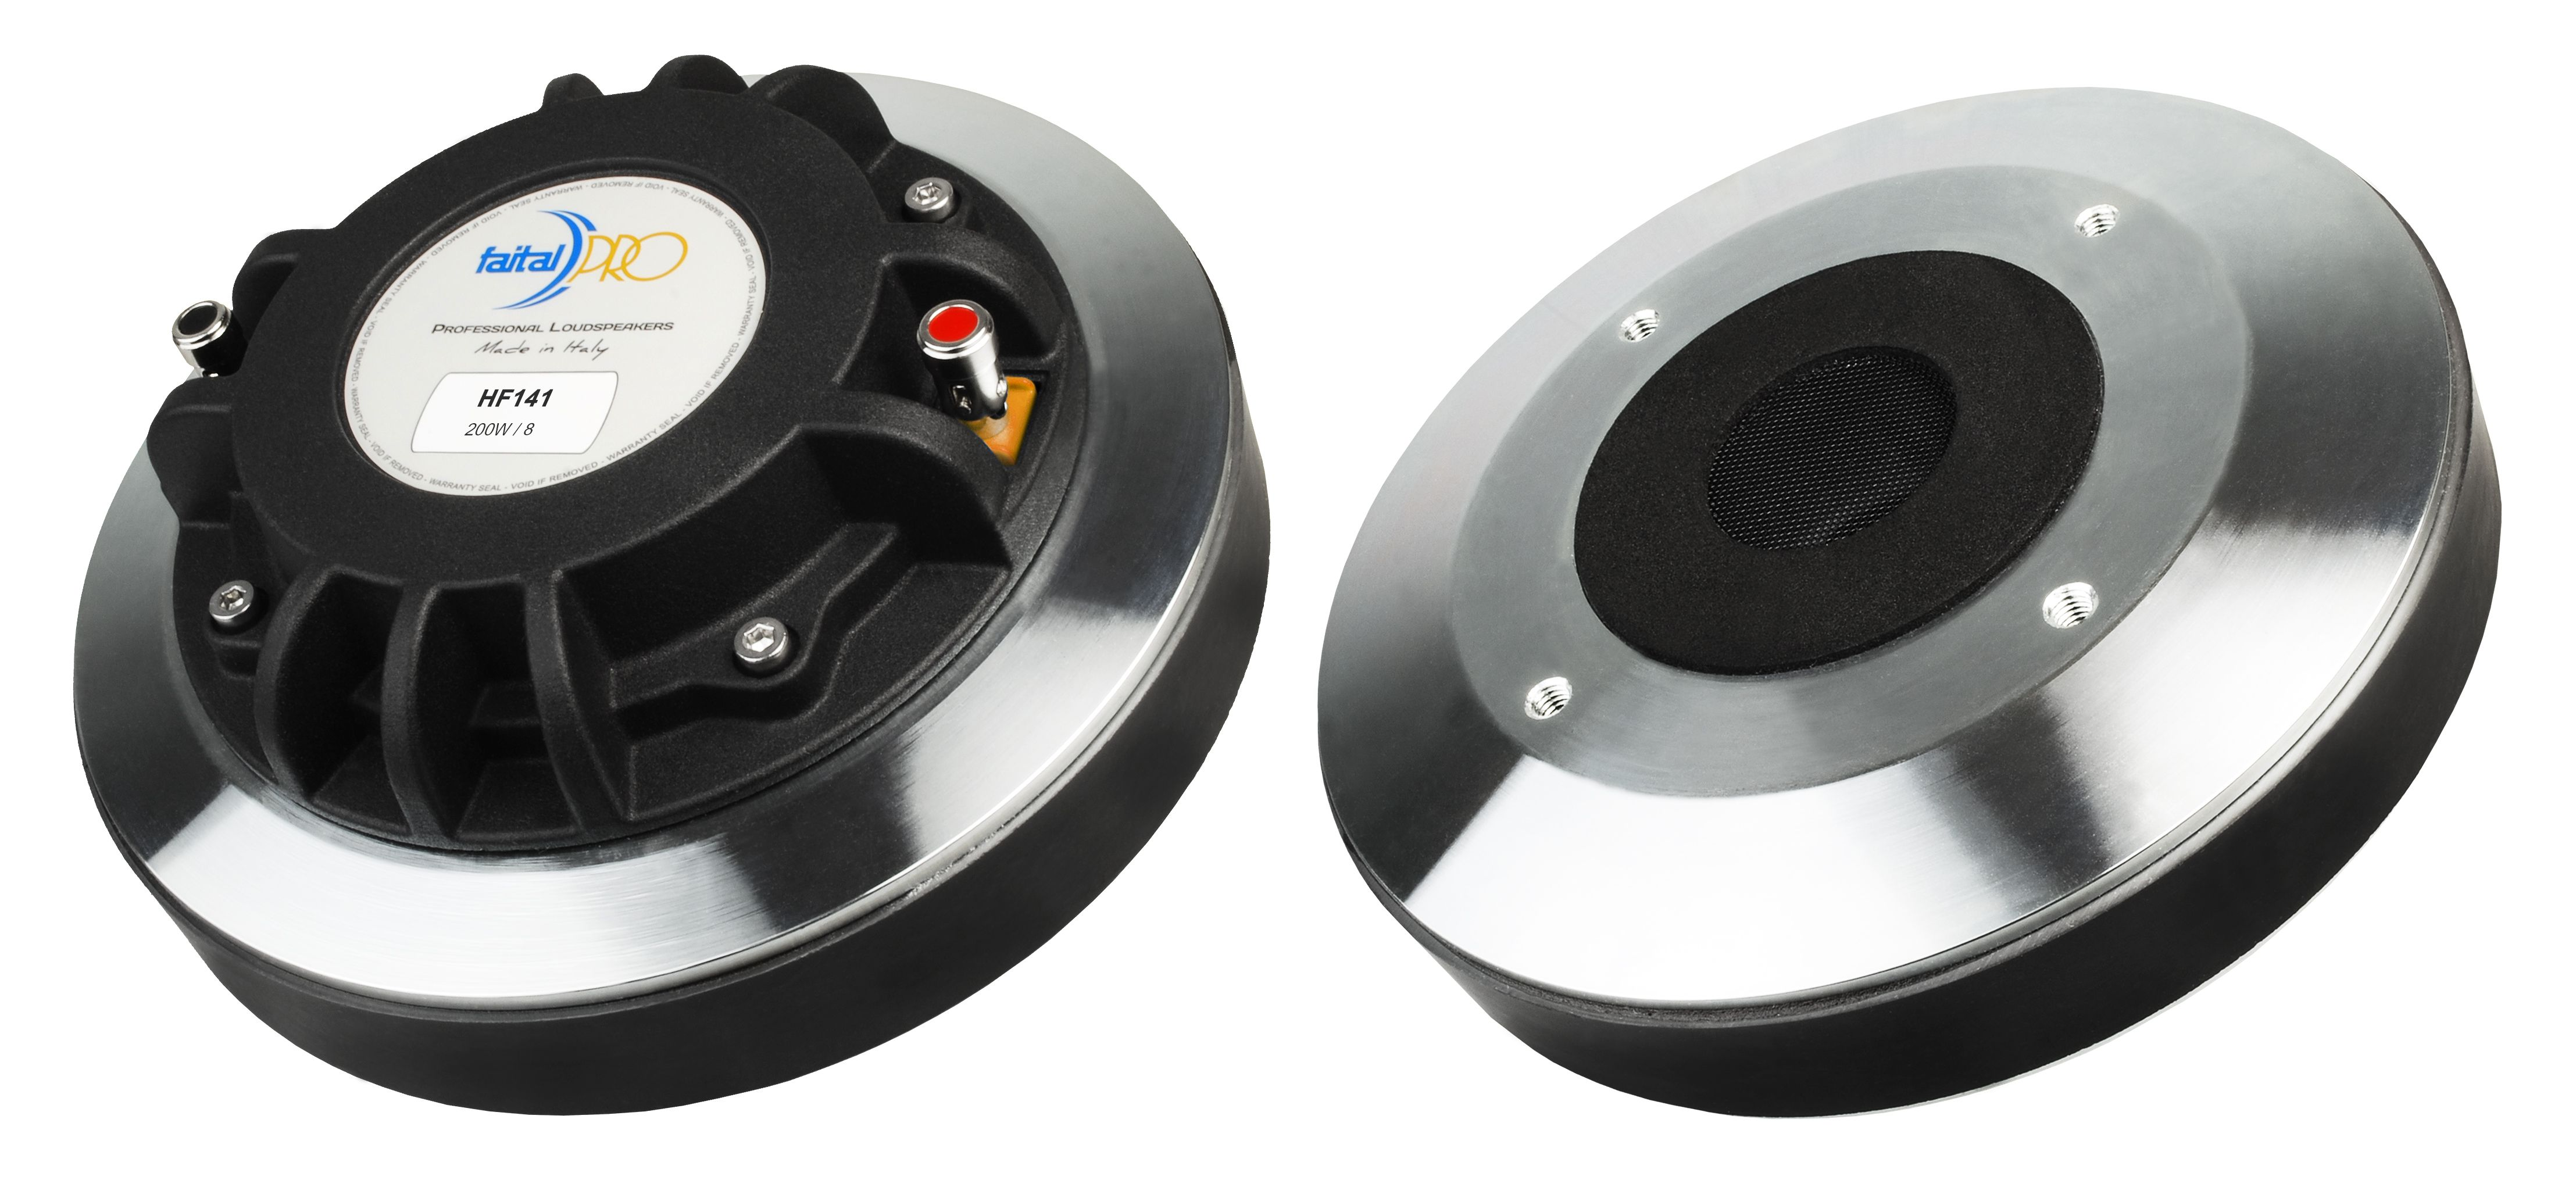 FaitalPRO HF143 8Ω   Compression